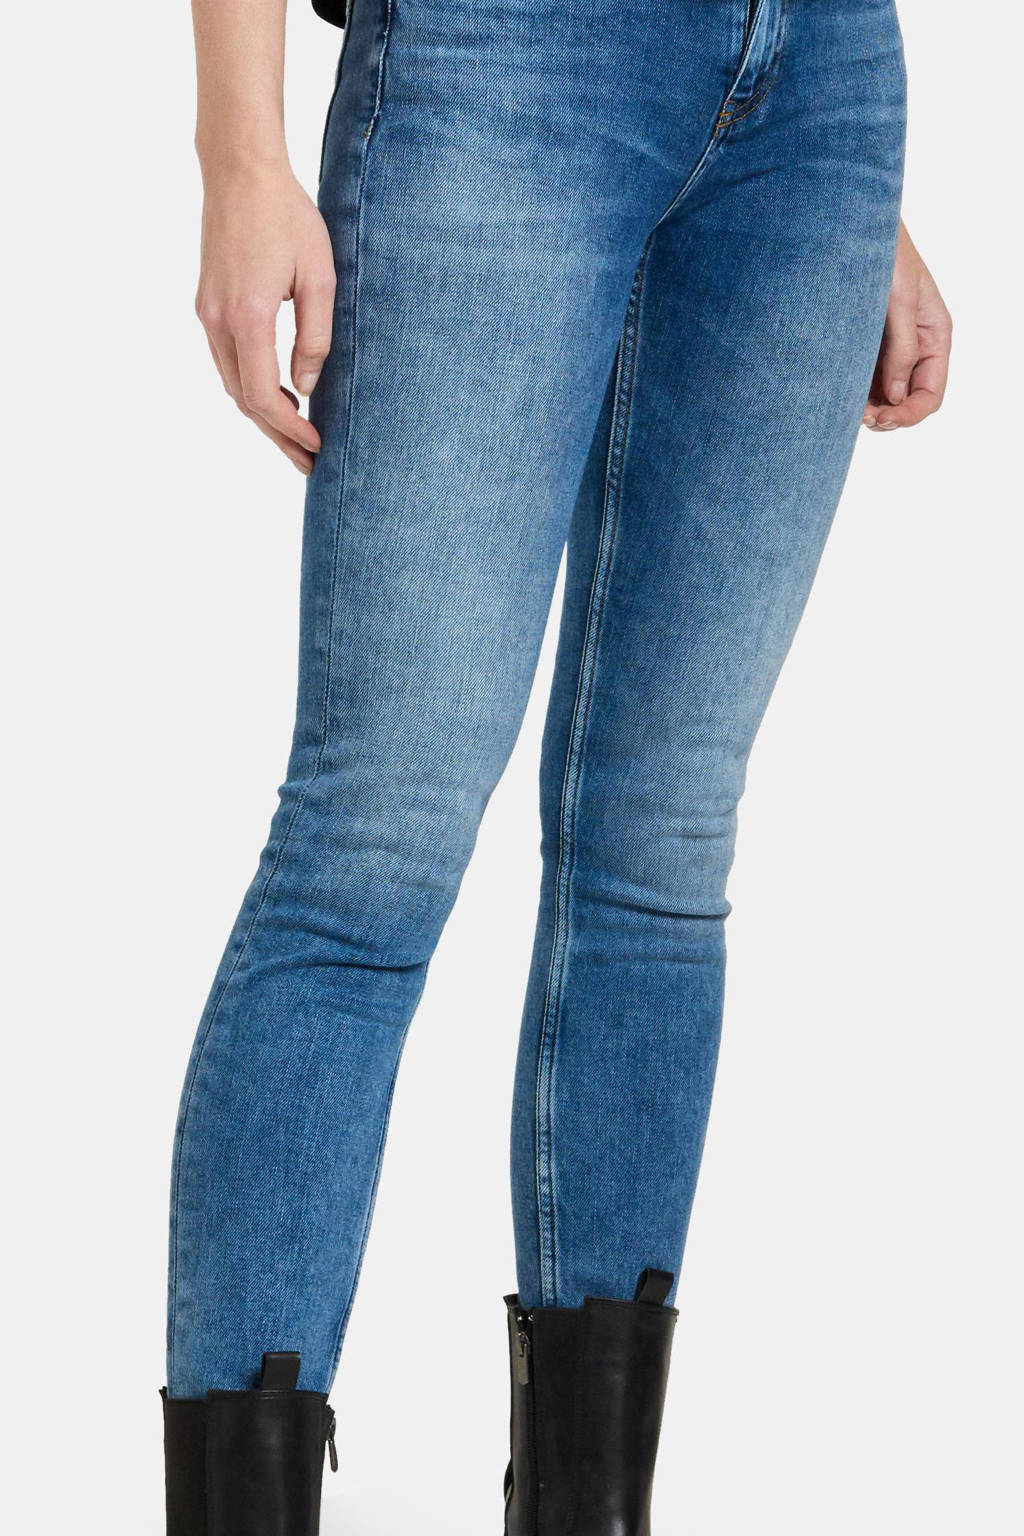 Eksept by Shoeby high waist skinny jeans Ametist Classic L28 mediumstone, MEDIUMSTONE